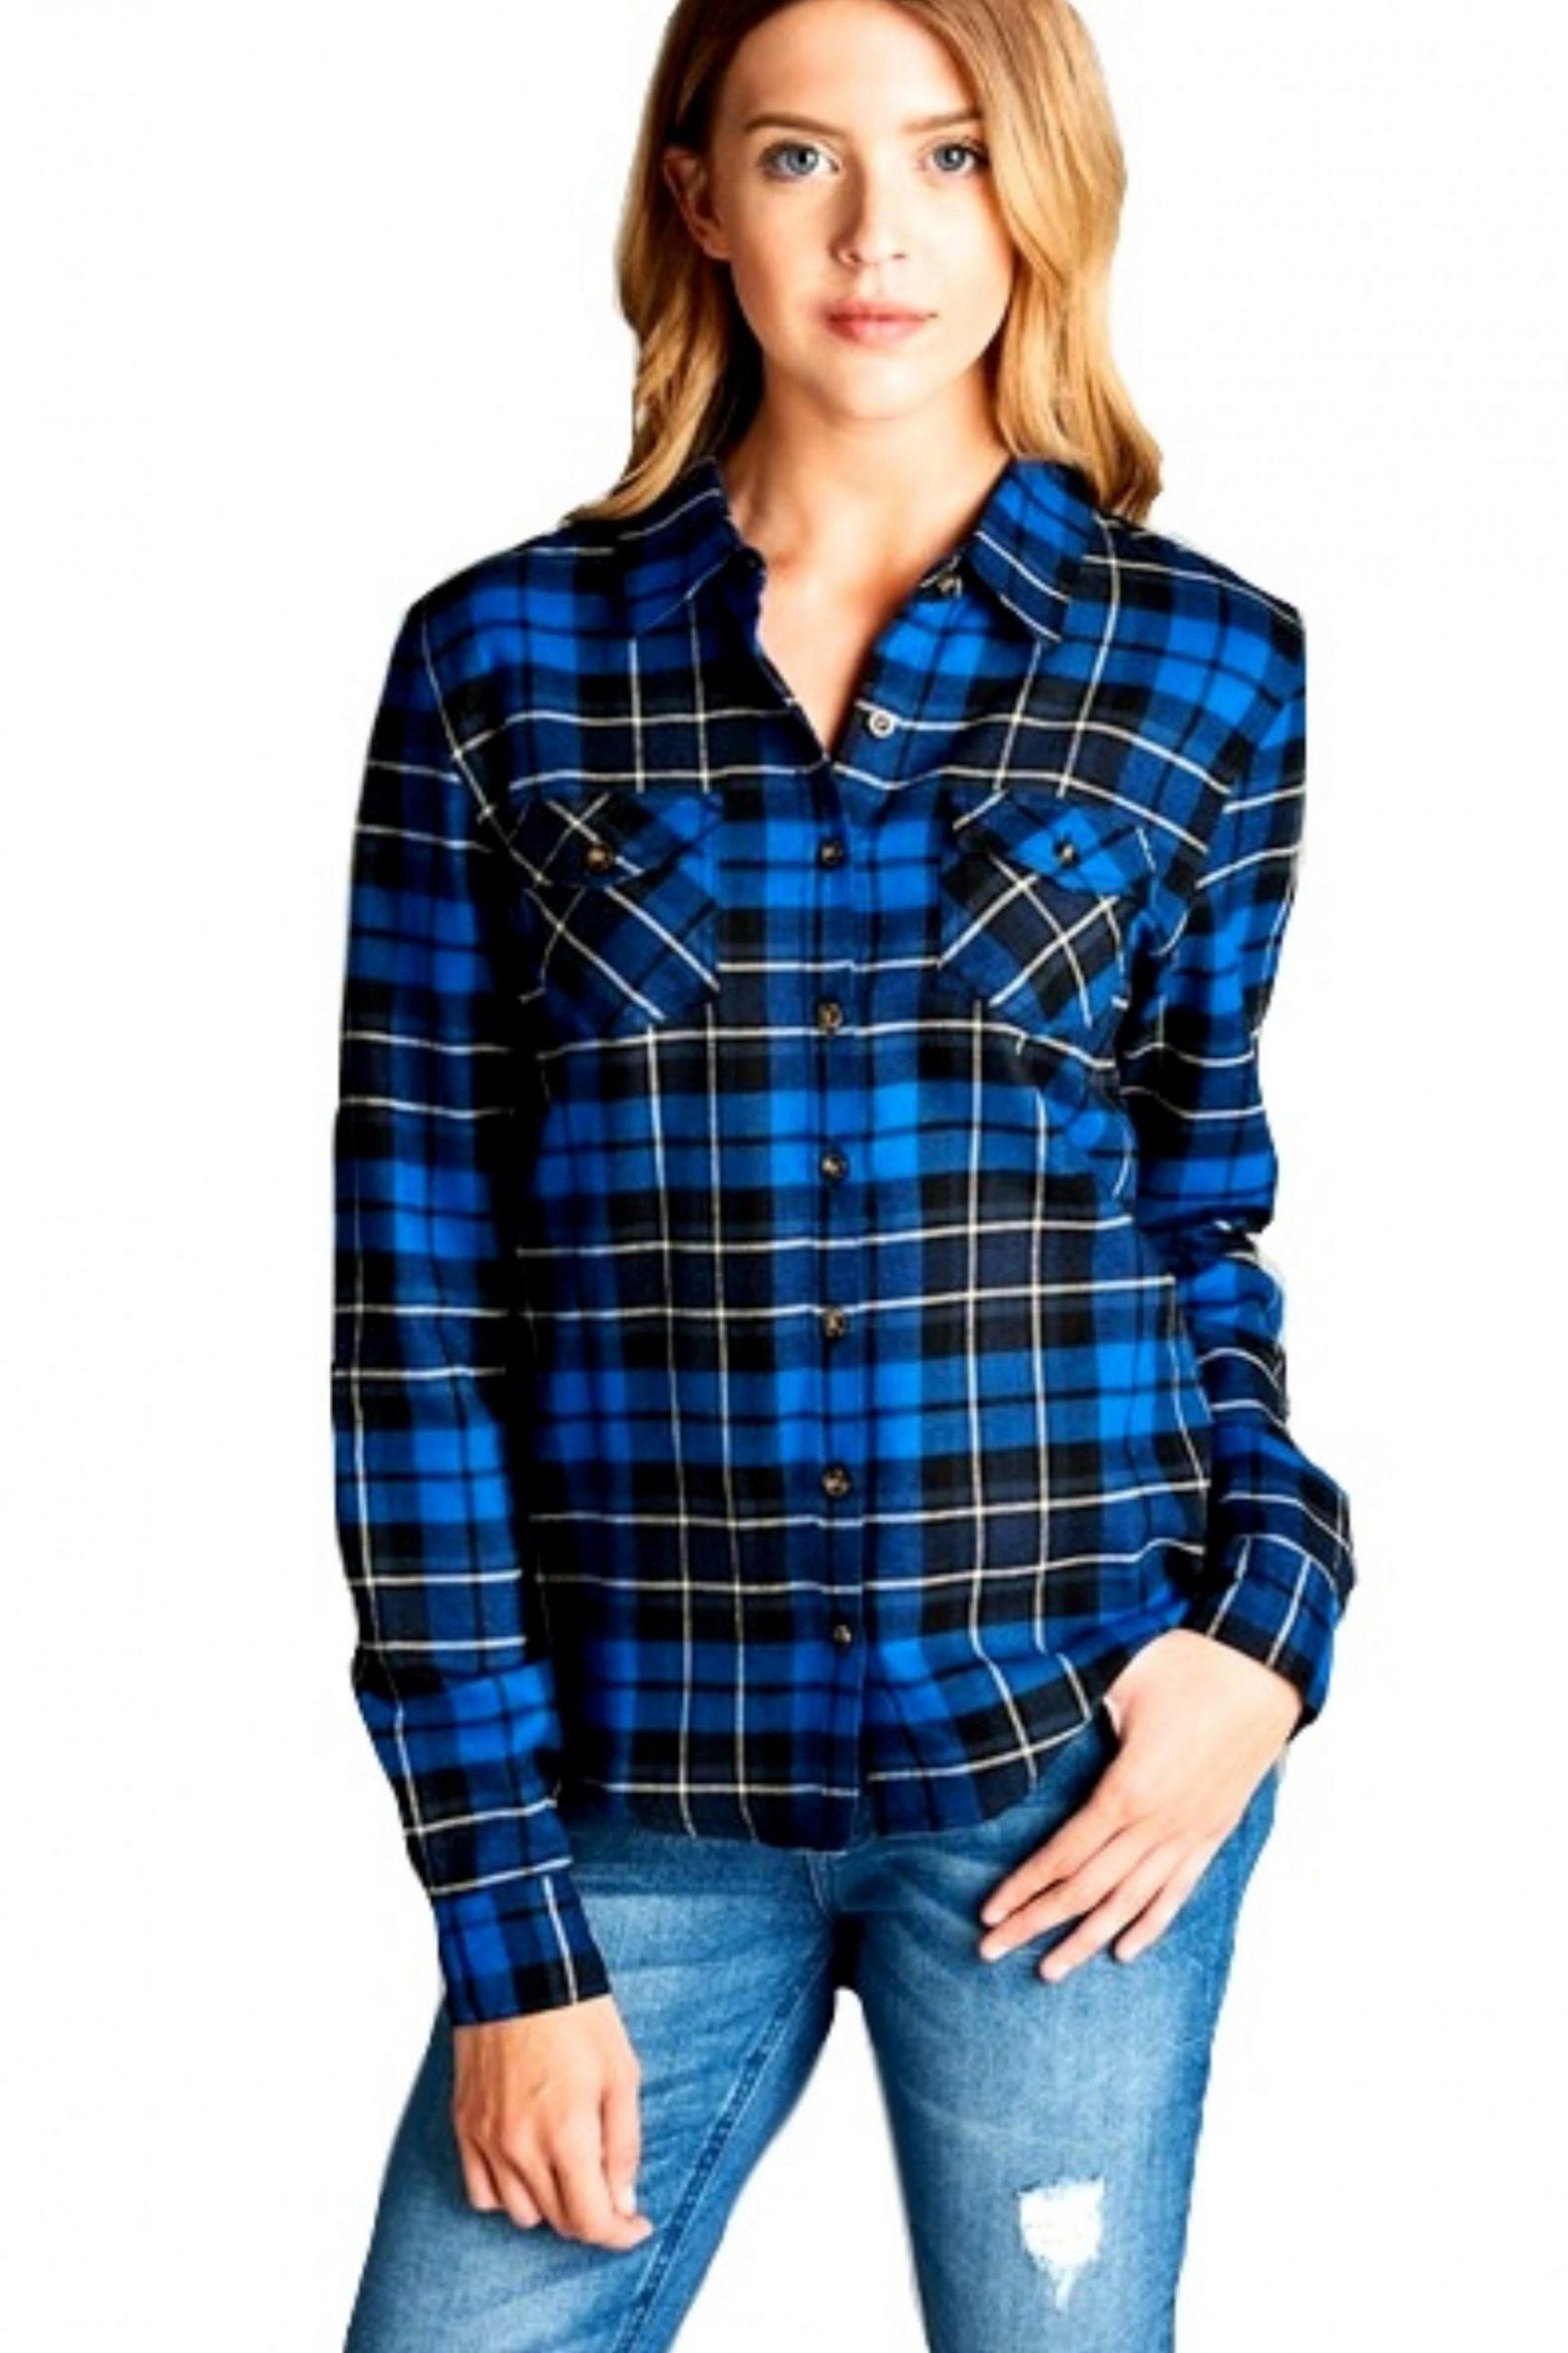 Blue and Black Tartan Plaid Shirt